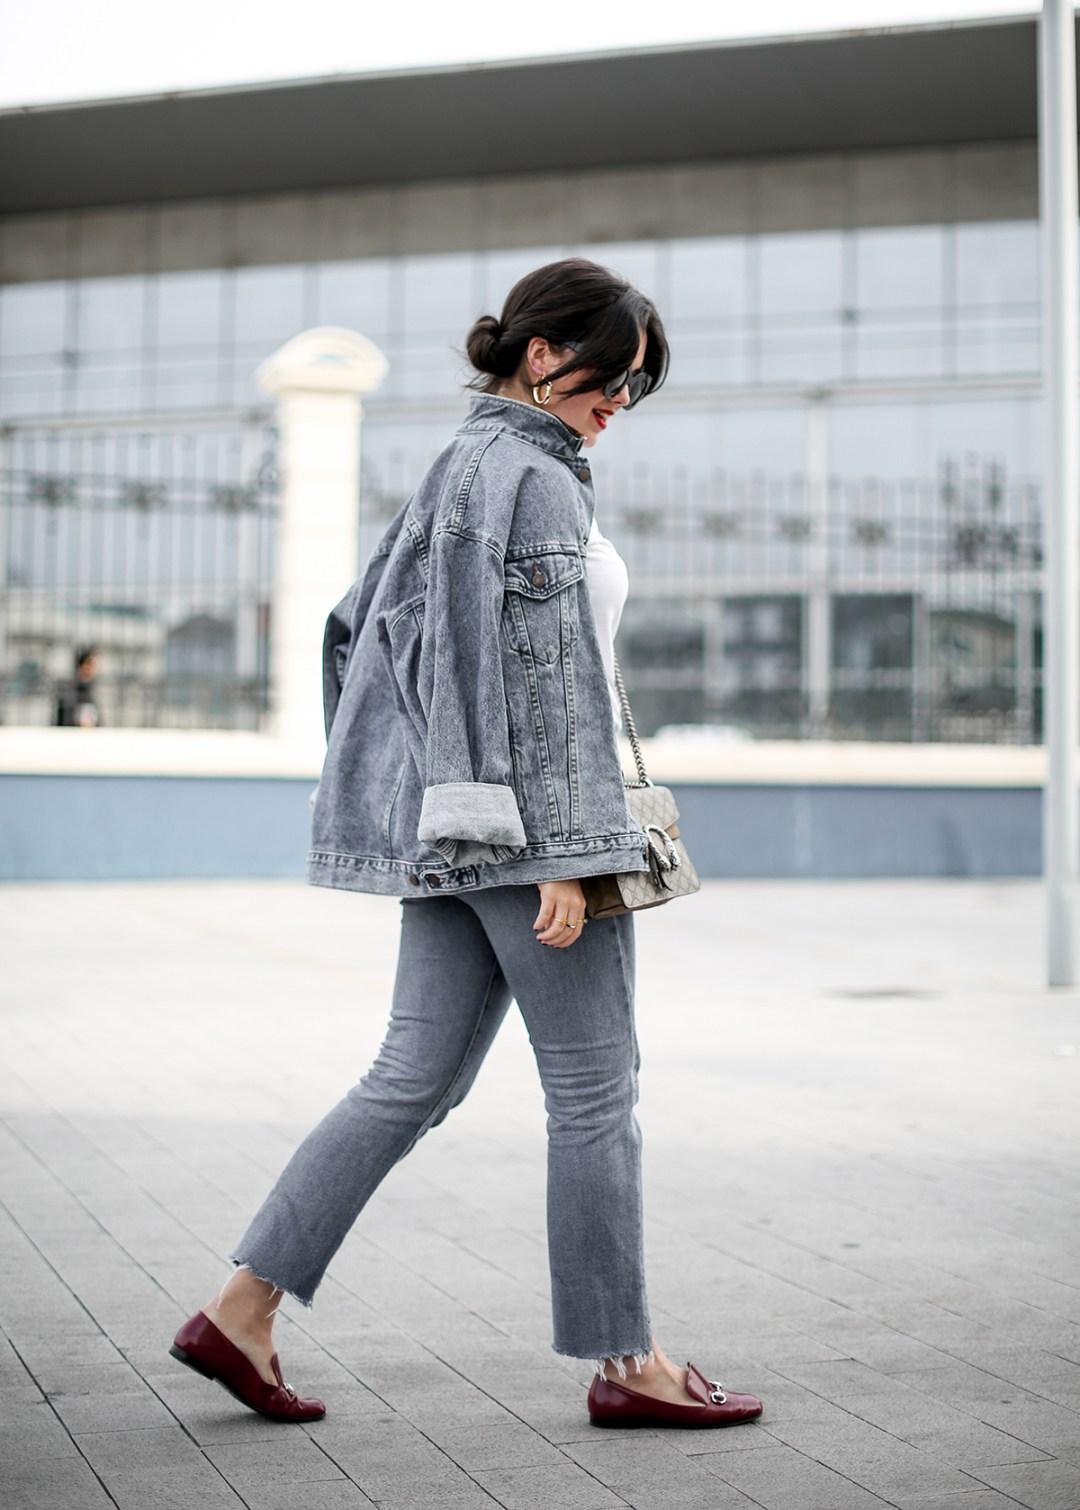 denim-total-look-levis-girl-vintage-gucci-horsebit-shoes-dionysus-bag7